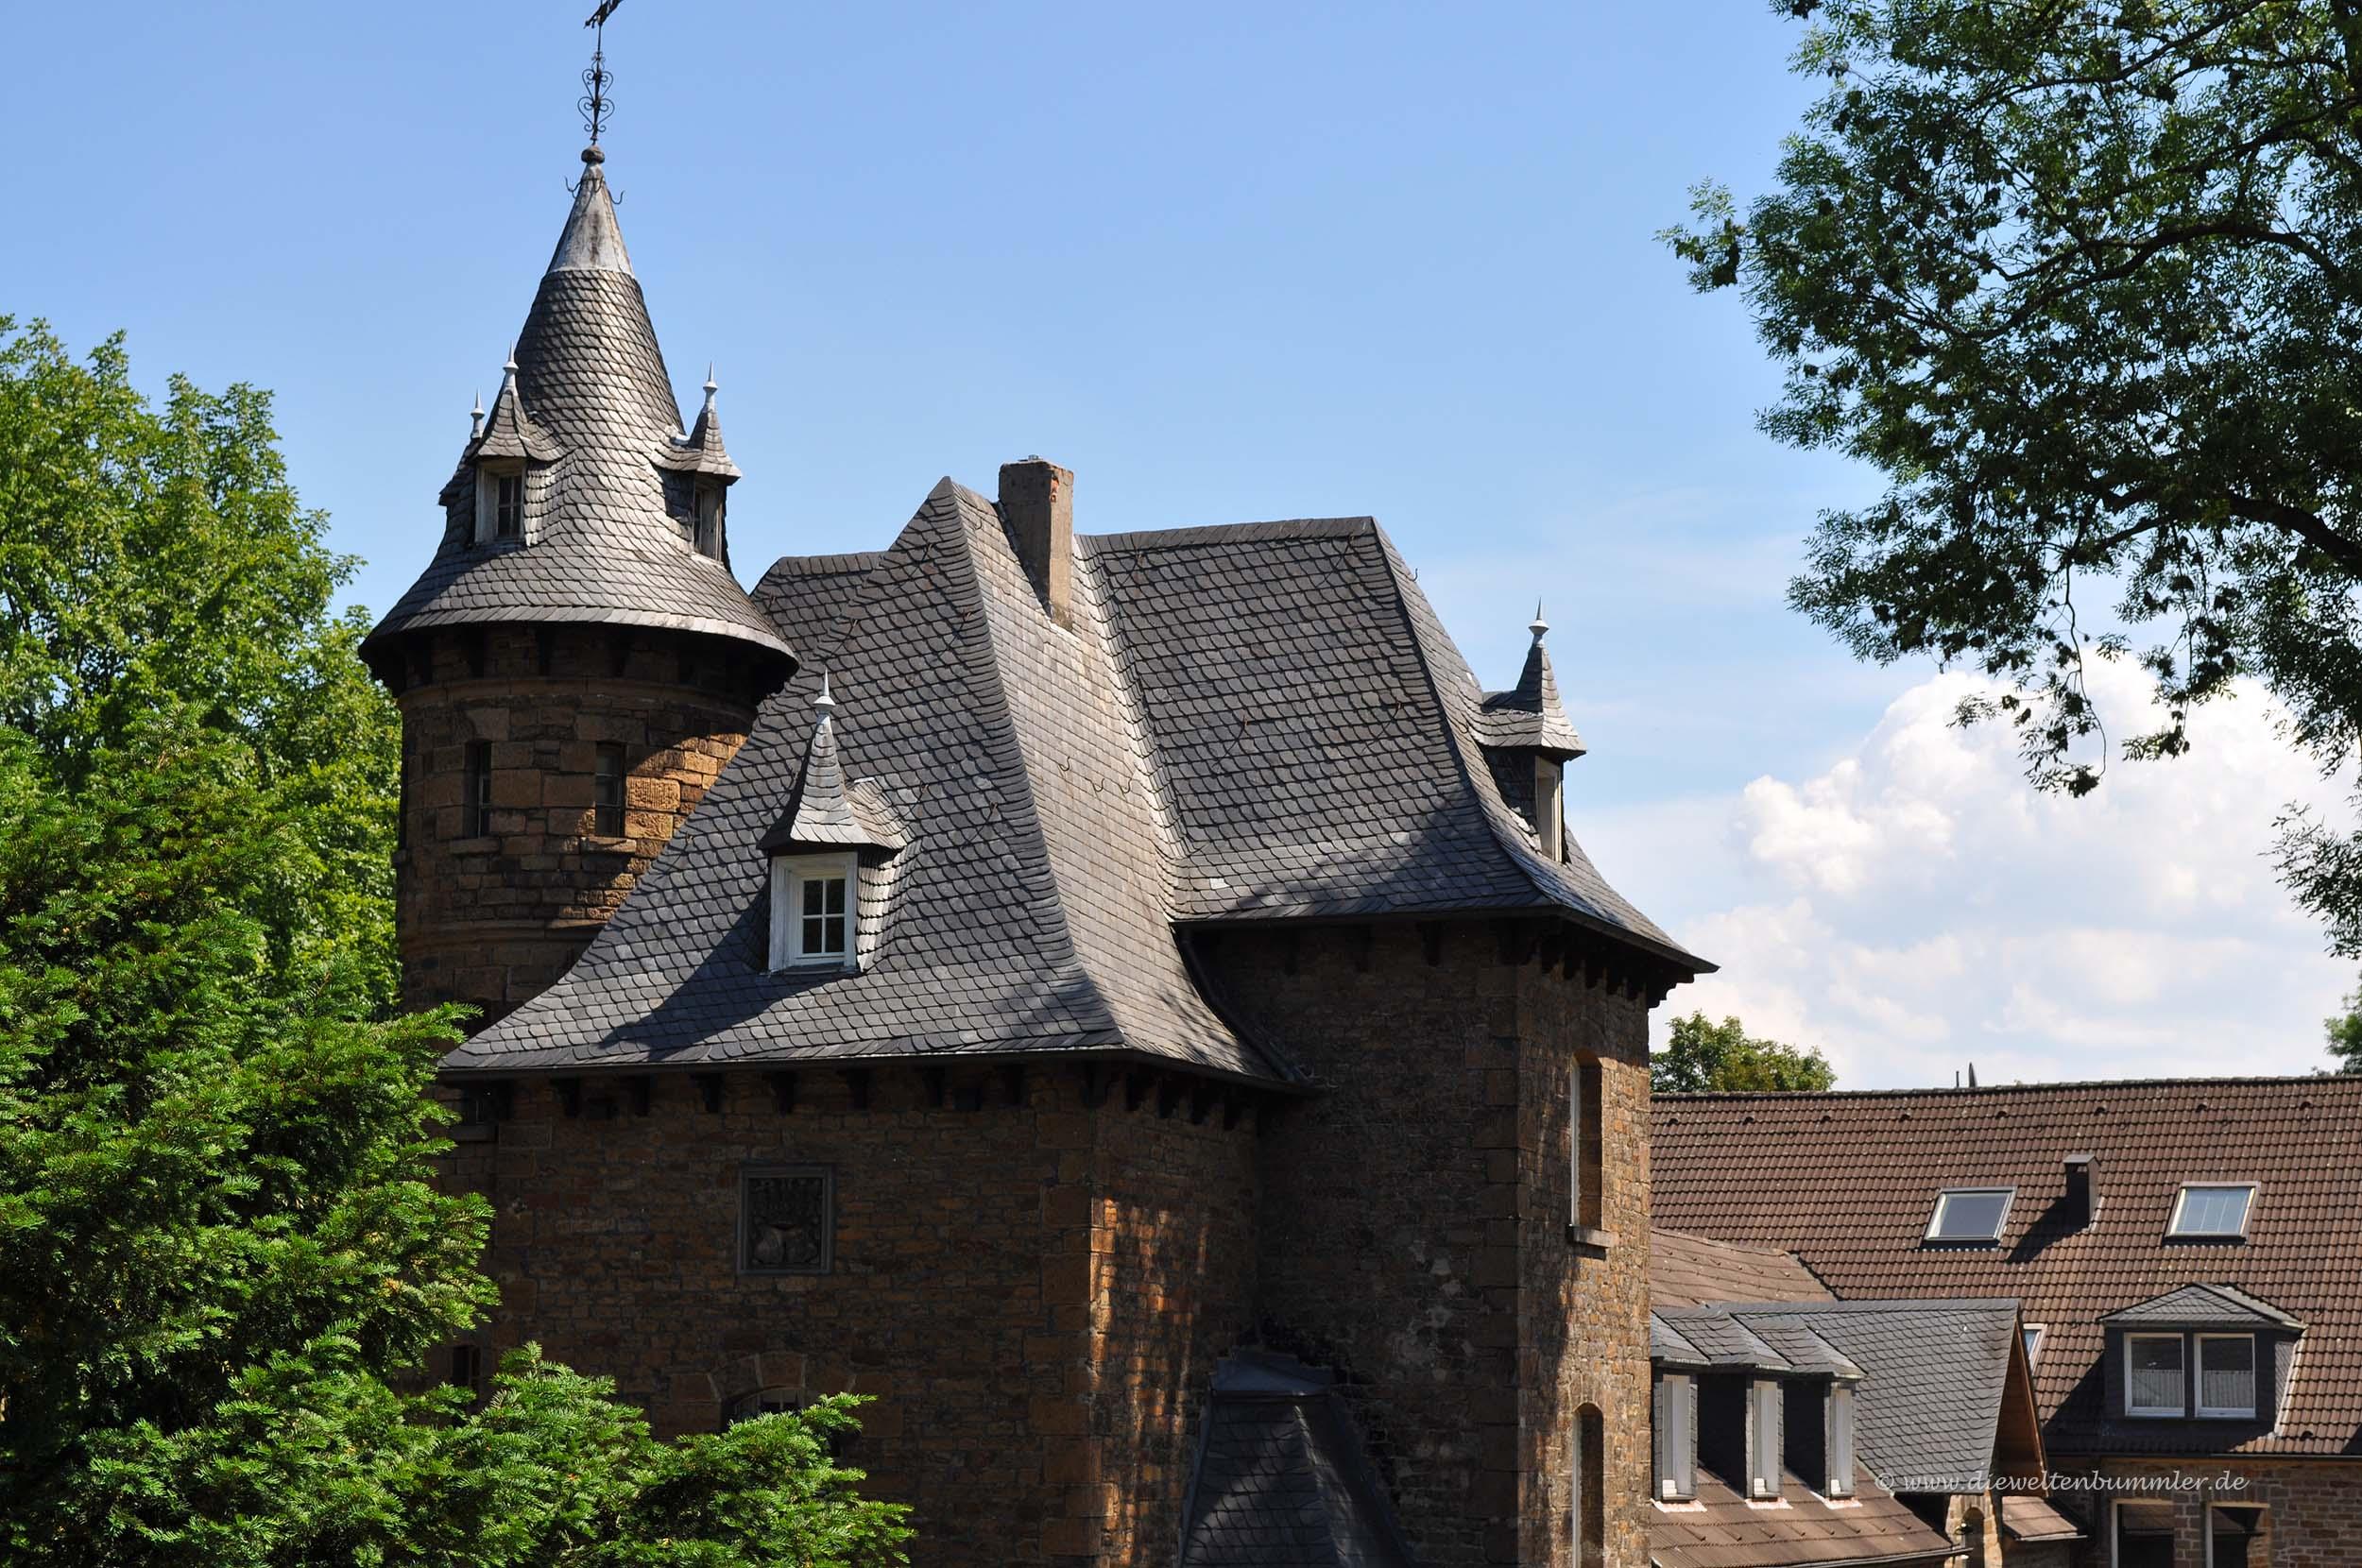 Schloss Schellenberg in Essen